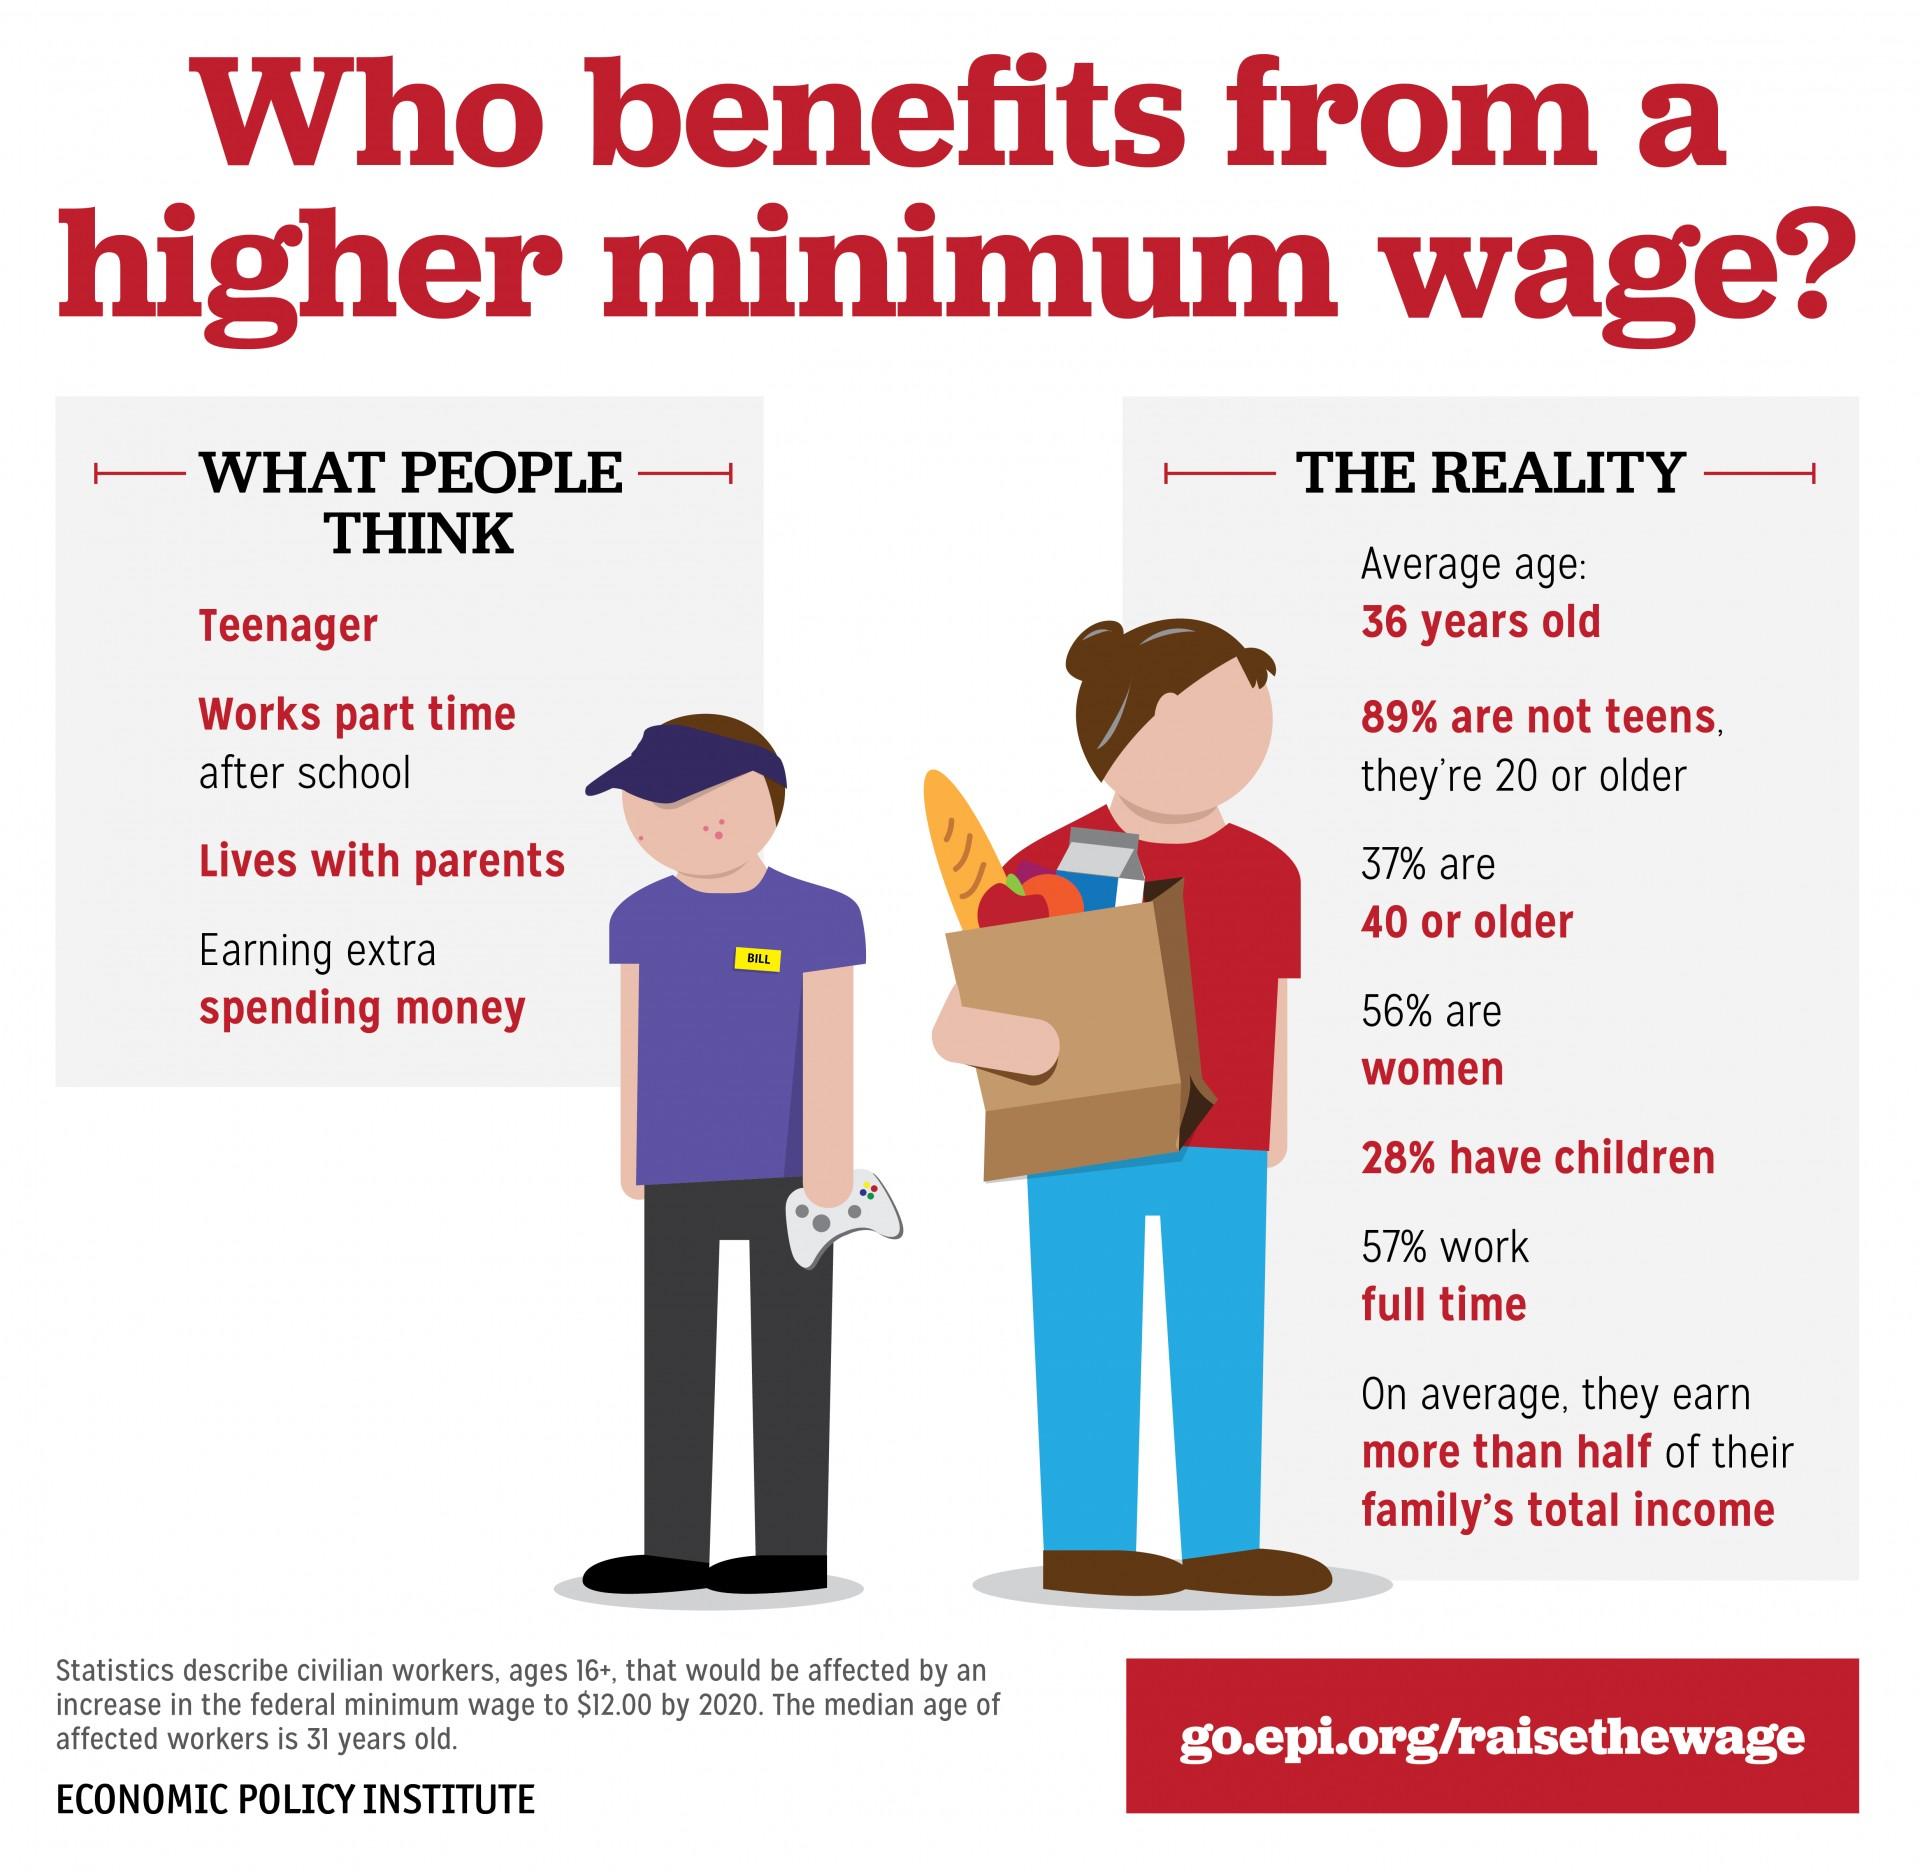 018 Minimum Wage Essay Example Low Snapshot Updated 2015 1 Impressive Persuasive Topics Contest Outline 1920